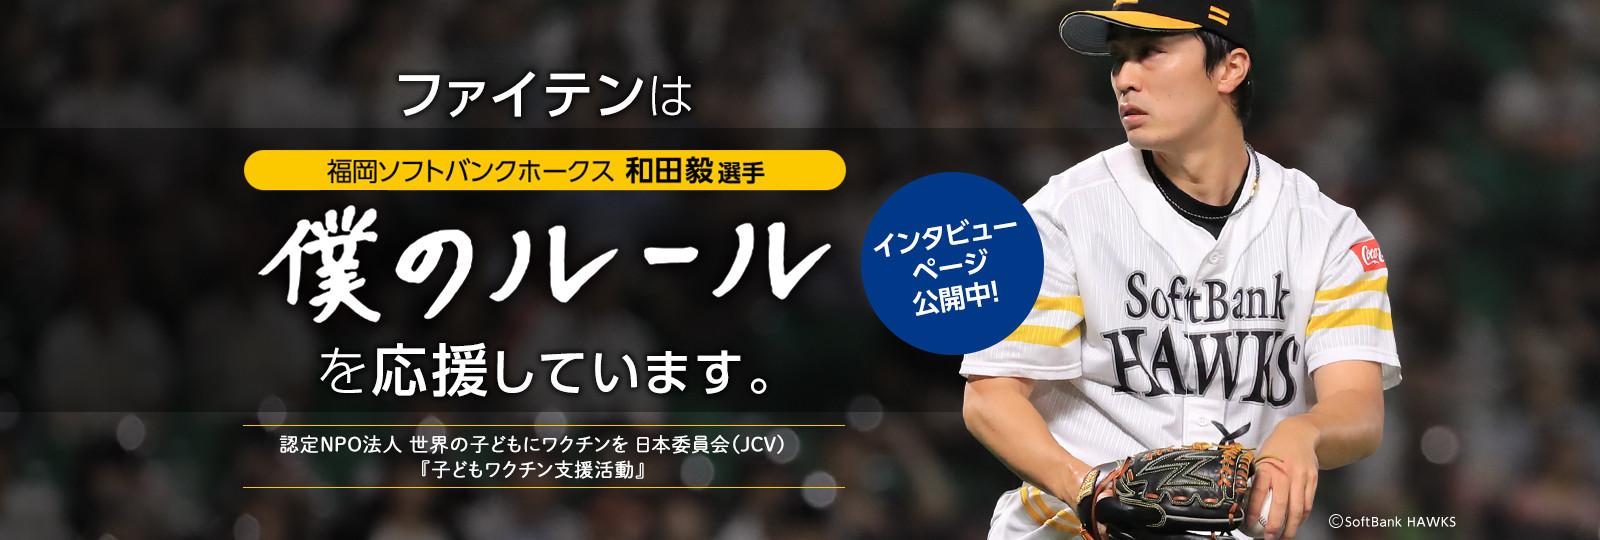 tsuyoshi-wada-interview2020_1600x540.jpg